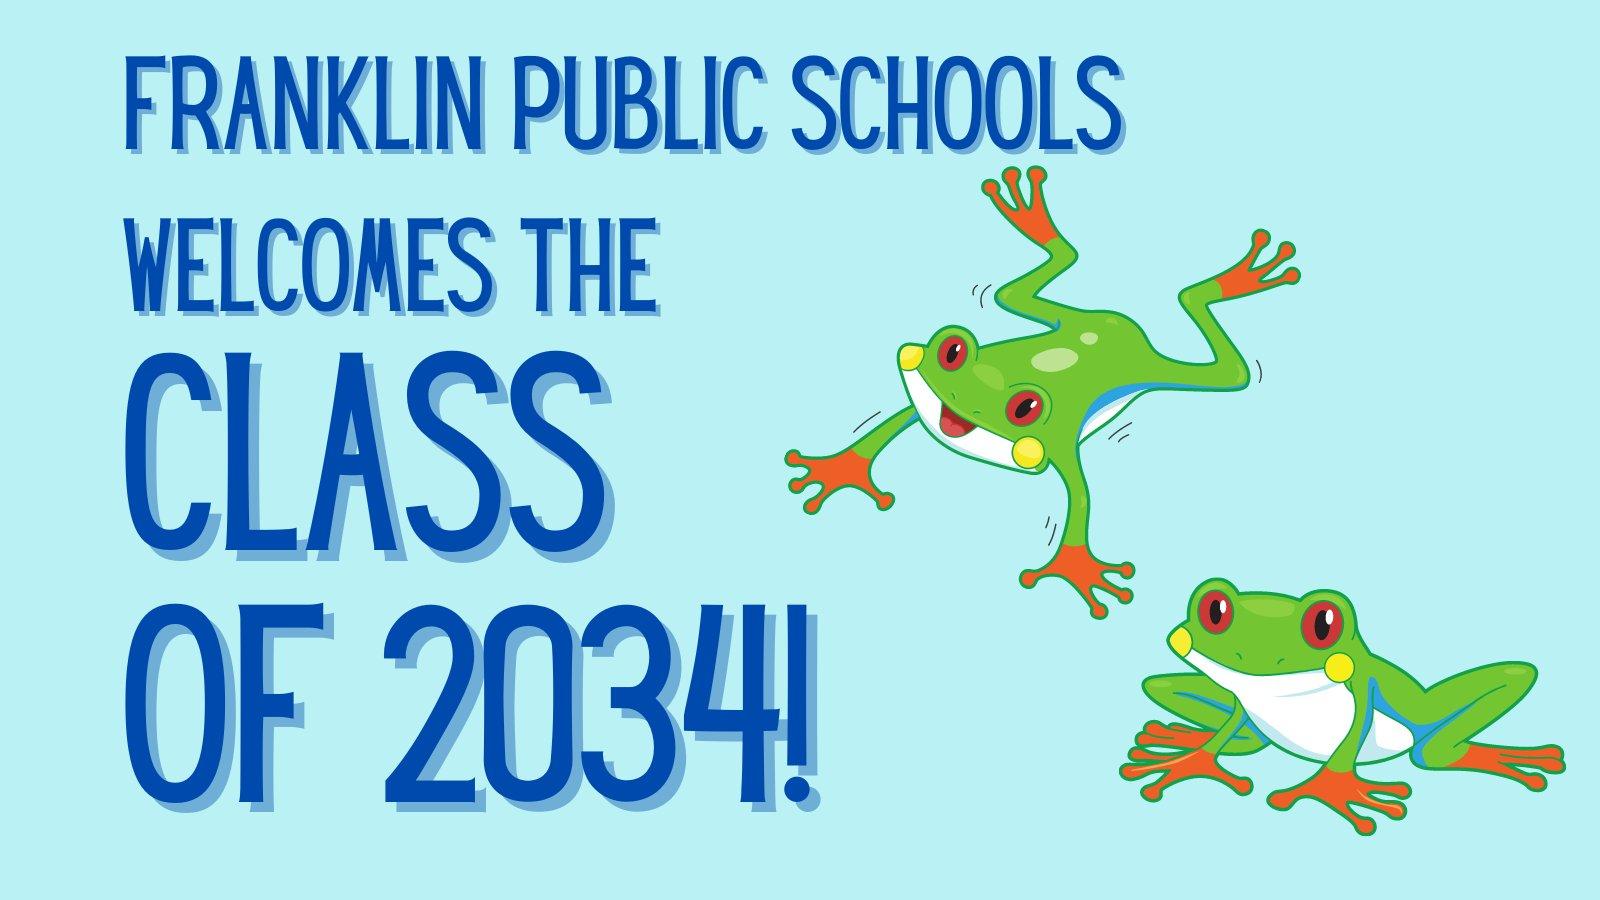 Franklin Public Schools: Kindergarten Registration Open for 2021-2022